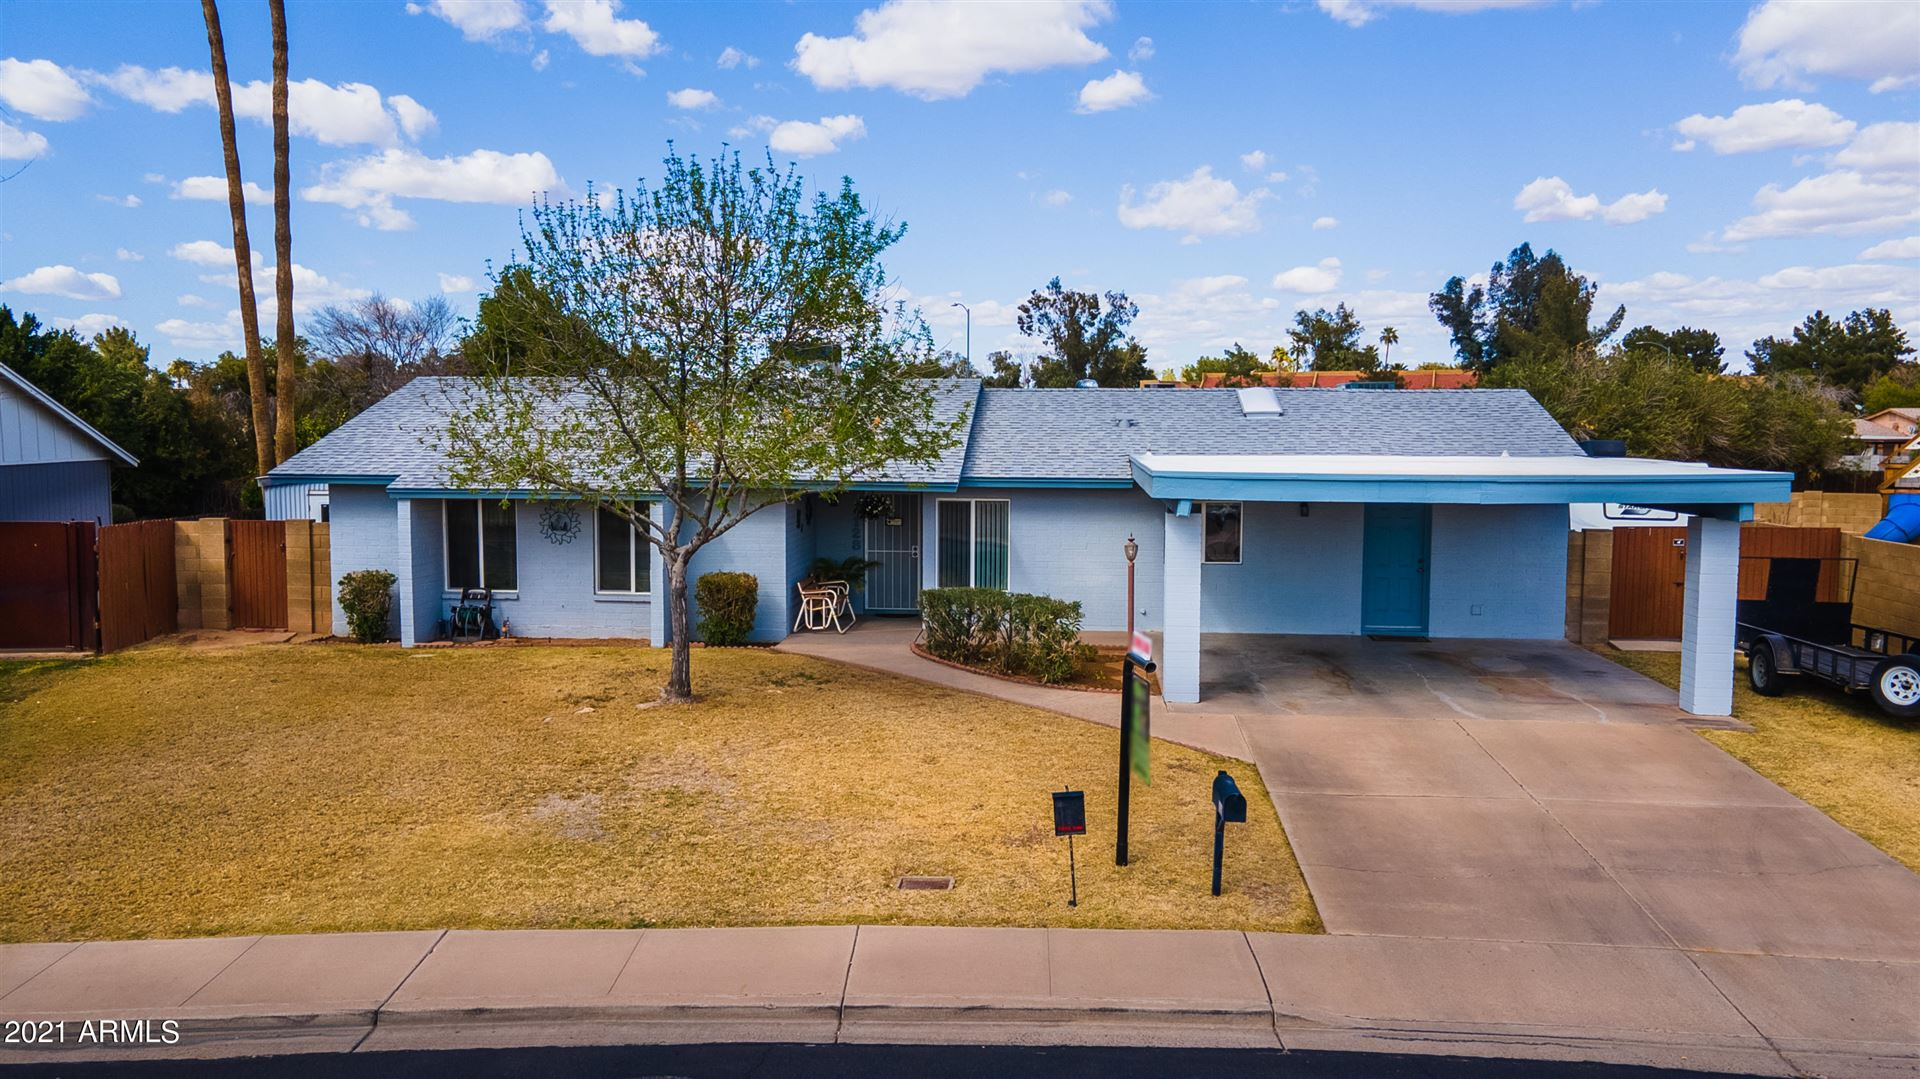 Photo of 1128 W KILAREA Avenue, Mesa, AZ 85210 (MLS # 6201106)